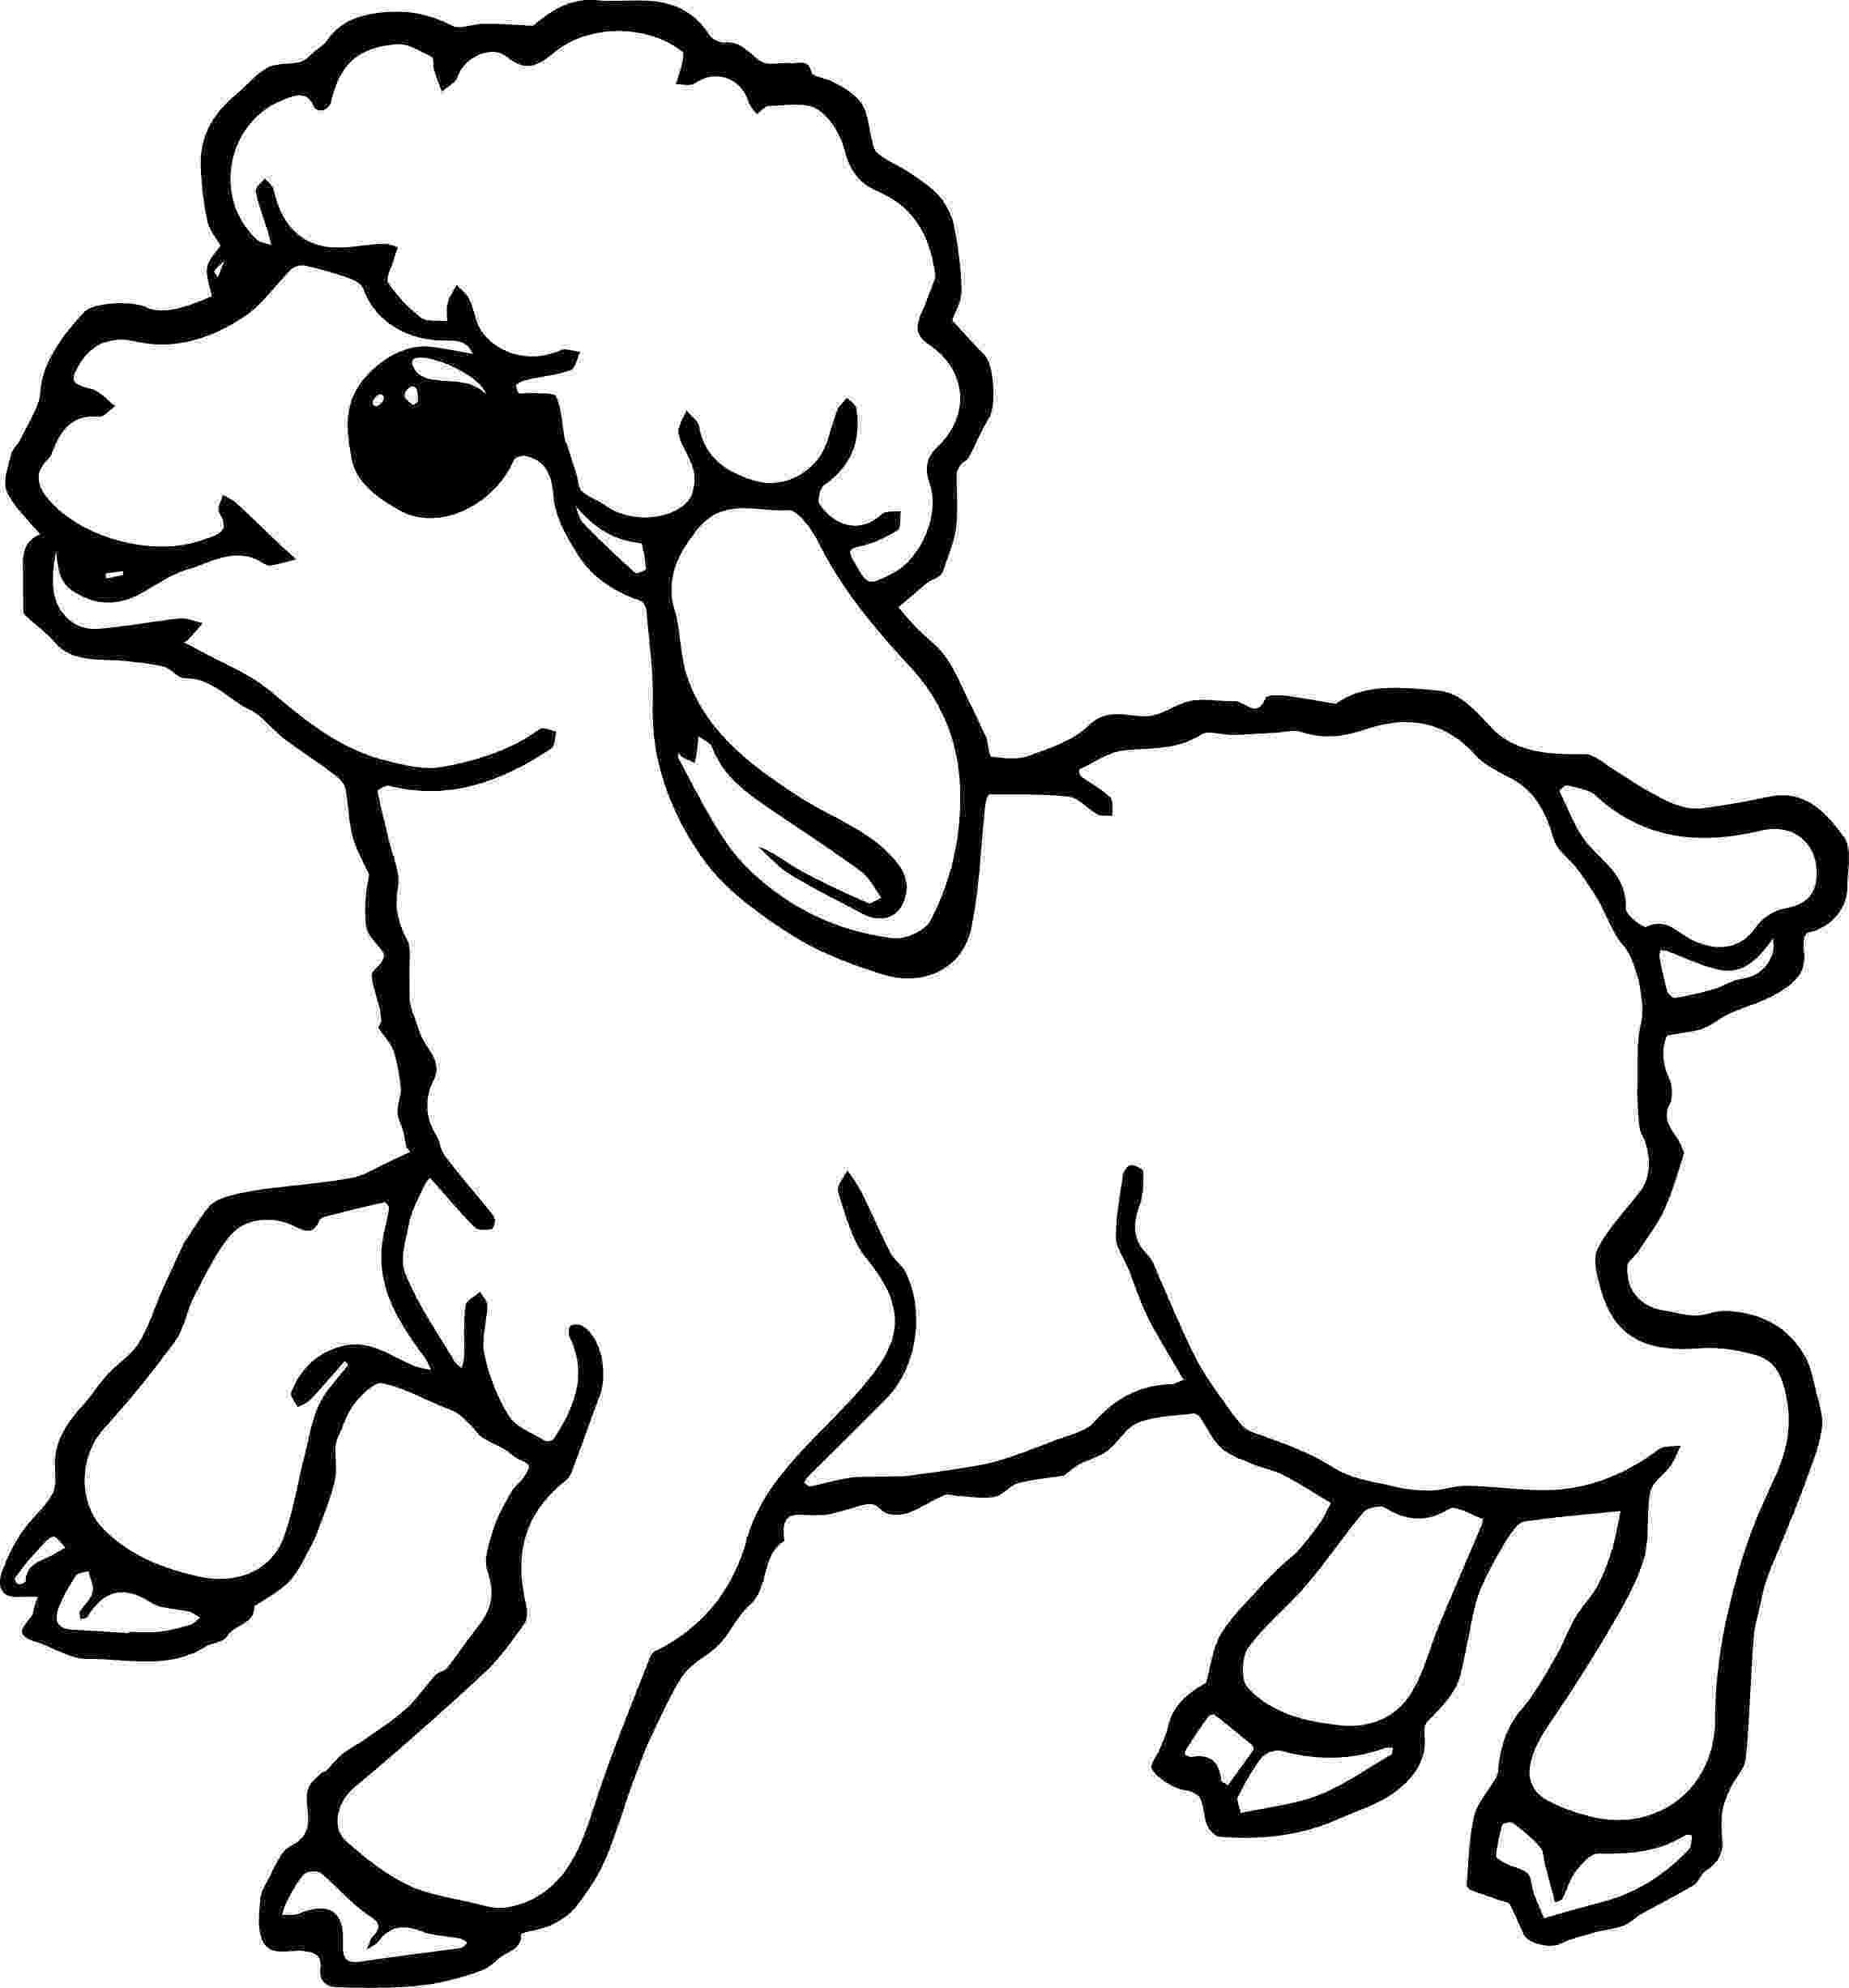 lamb coloring sheet share our garden virtual road tripnew zealand lamb sheet coloring